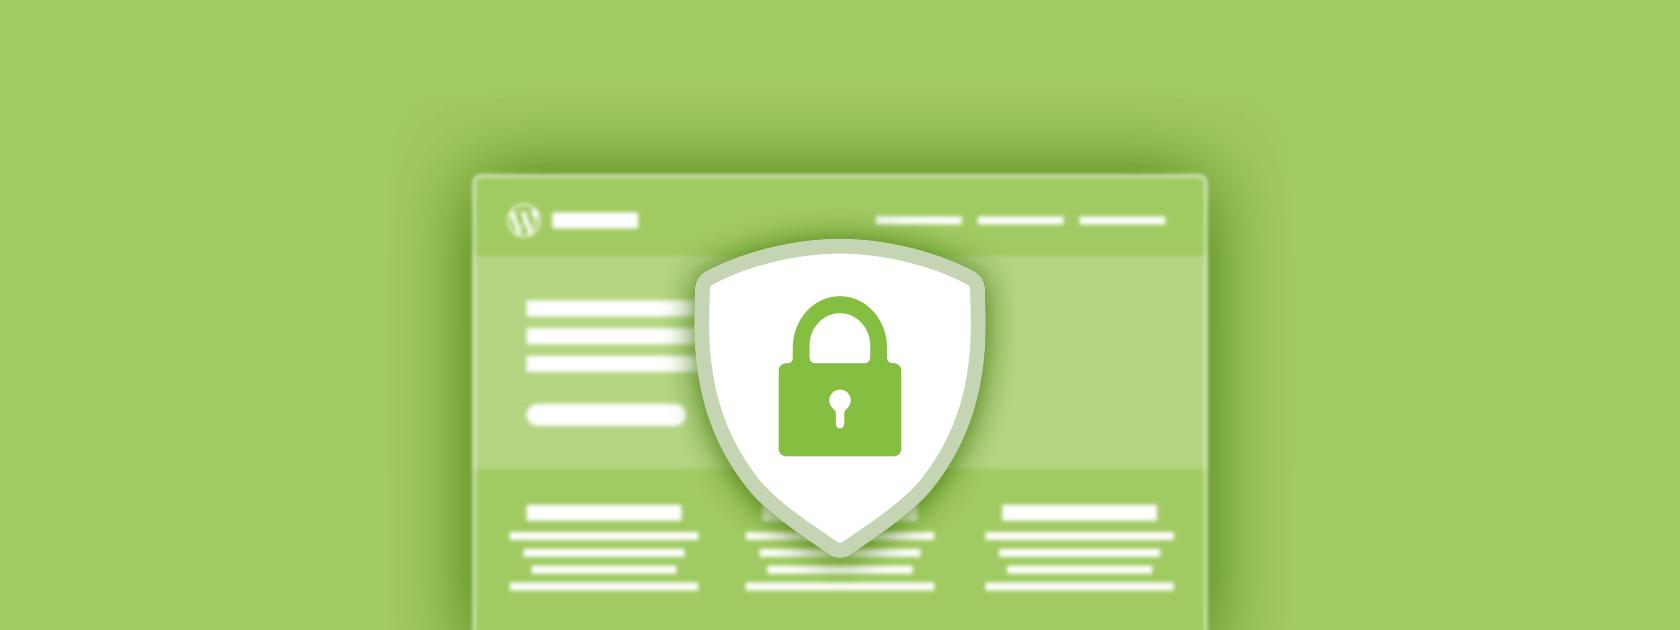 Are you sharing sentitive data & passwords on freelancer websites? 4